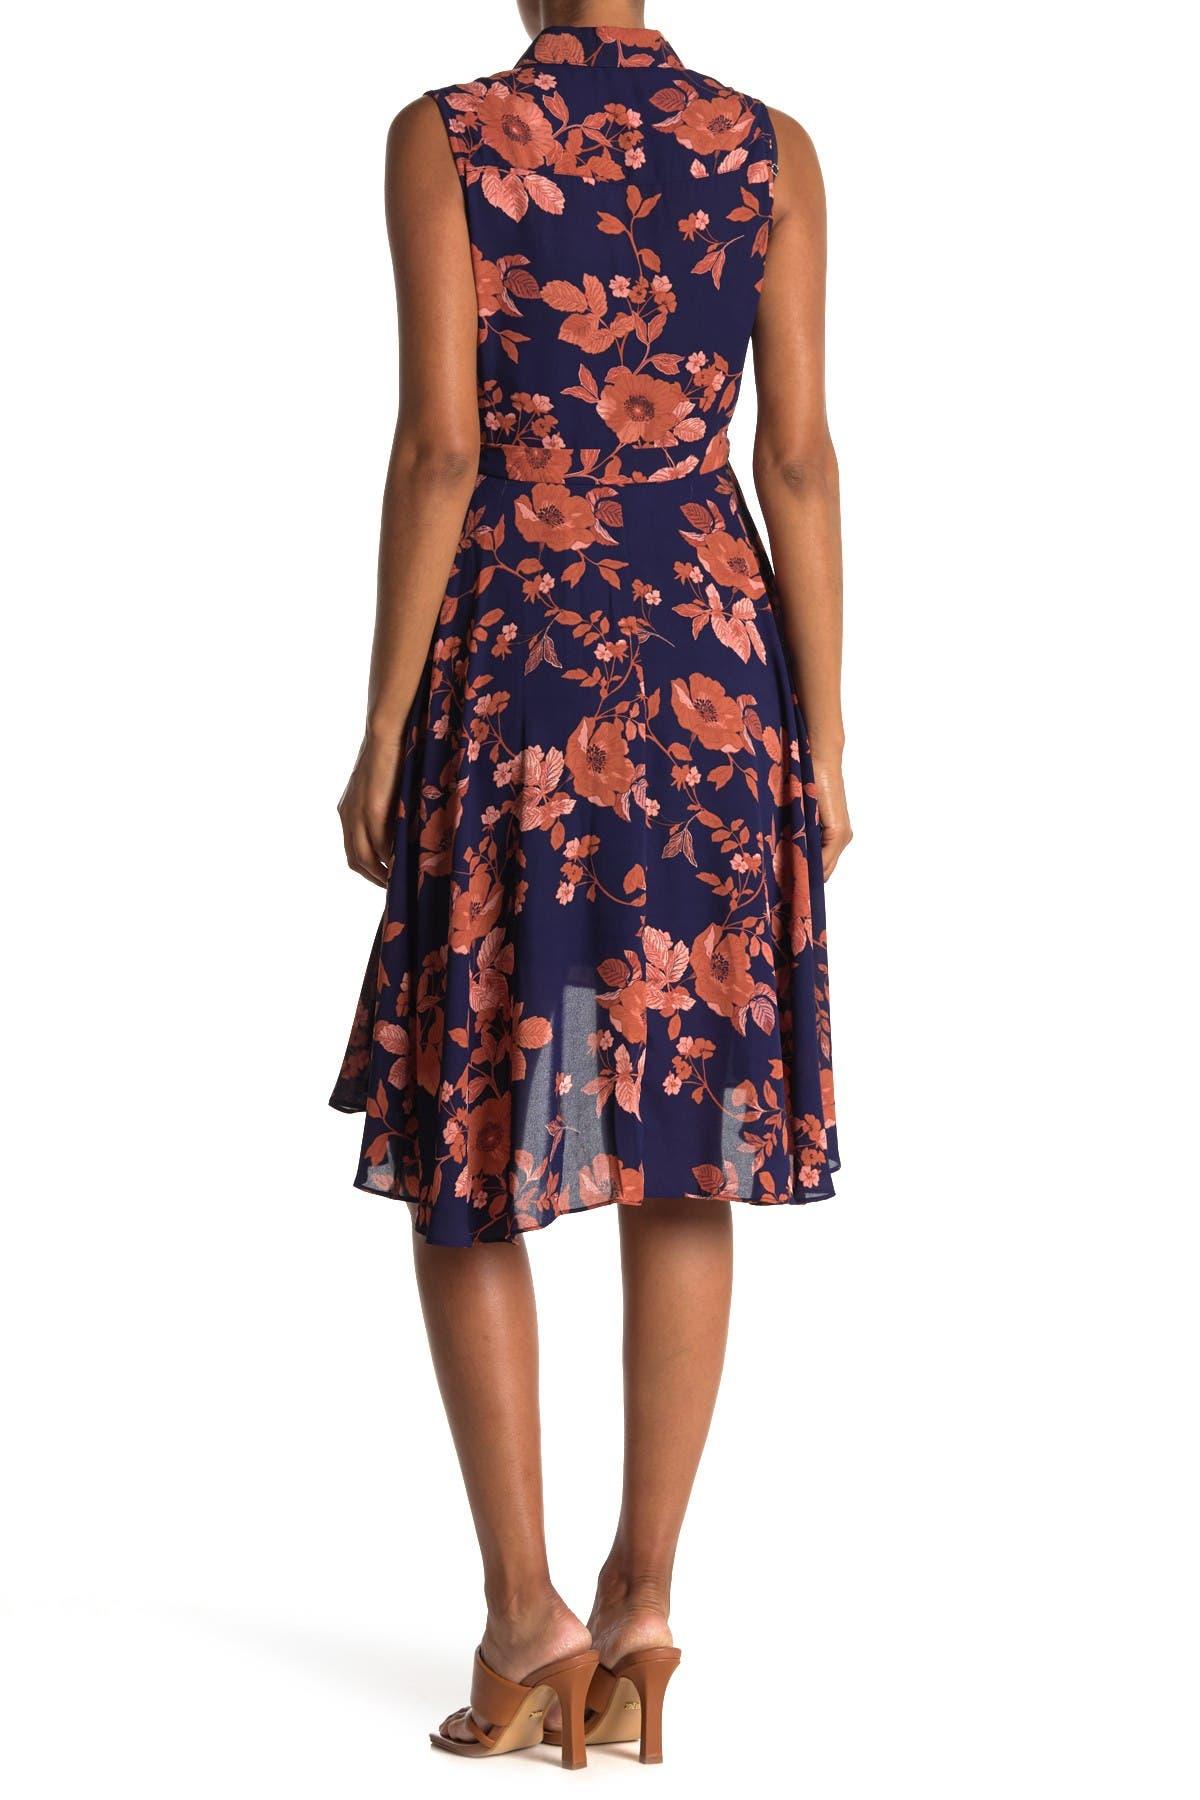 Image of NANETTE nanette lepore Pintuck Pleated High/Low Dress